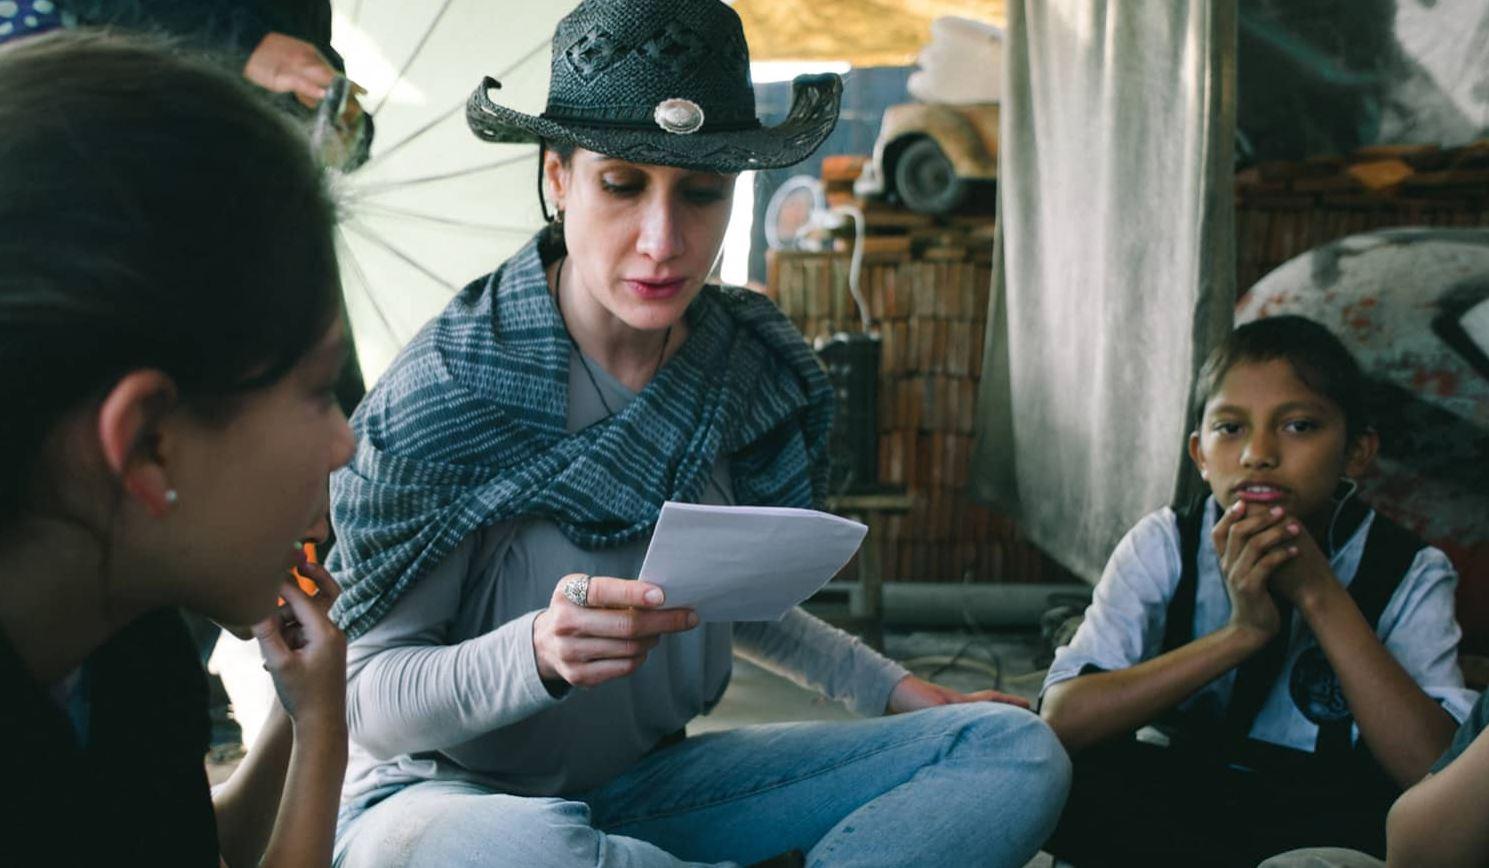 La cineasta mexicana Issa López prepara Our Lady of Tears con Blumhouse